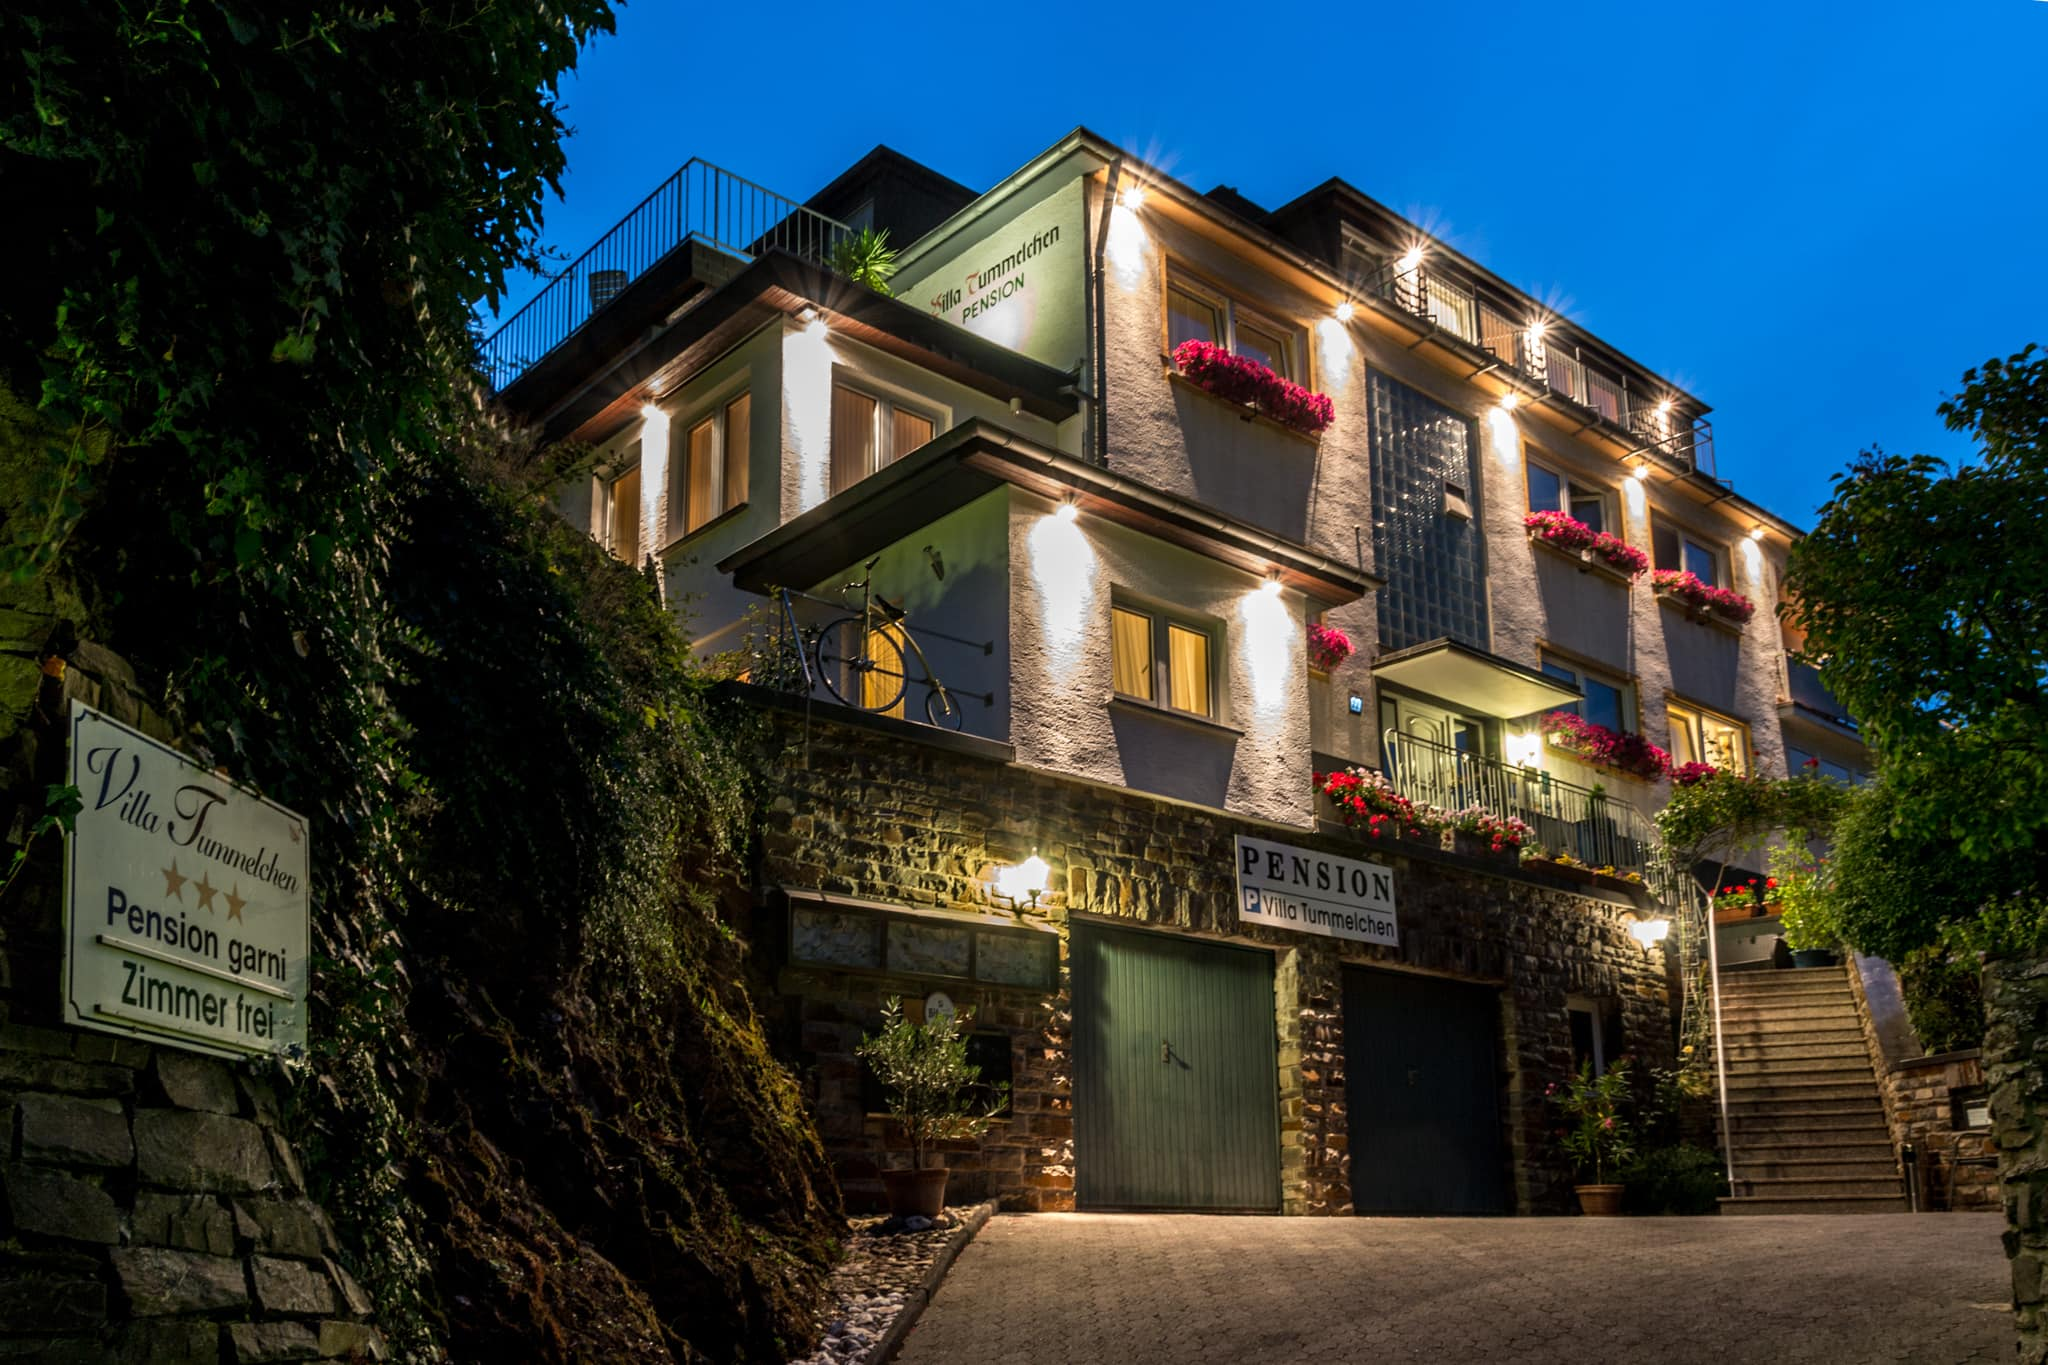 Hotel Pension Villa Tummelchen im Sonnenuntergang im Sommer